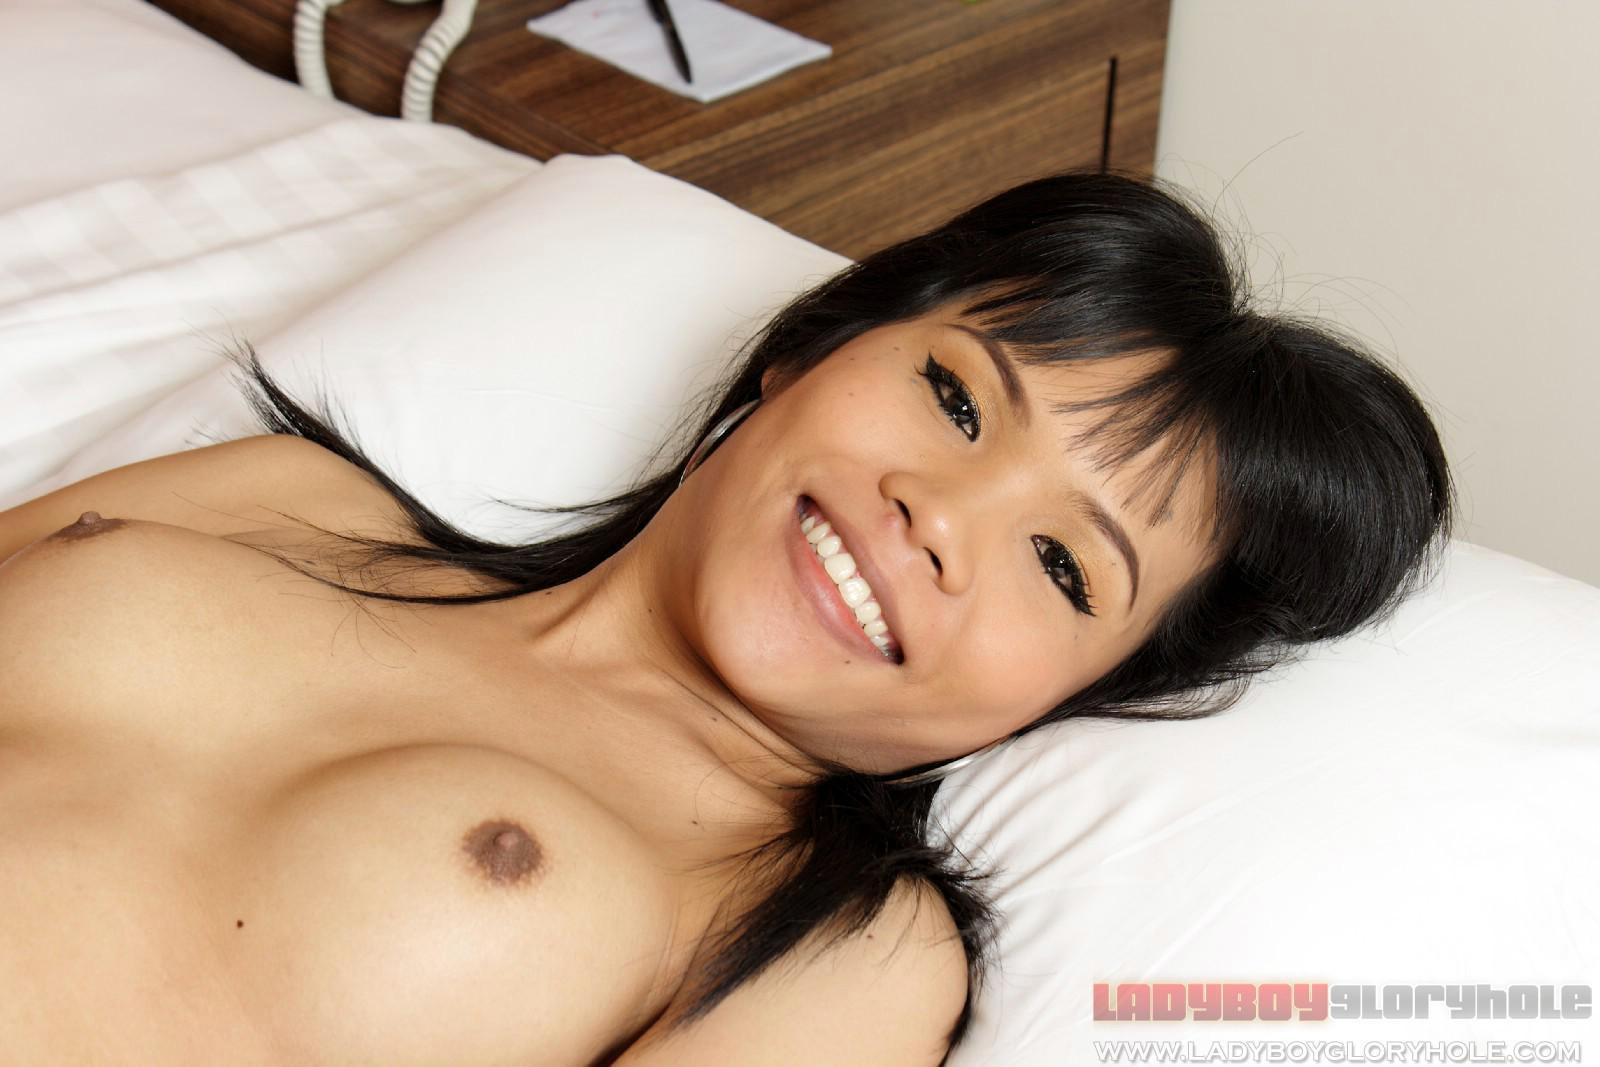 Cute Teen T-Girl In Bikini Exposing Her Nice Asian Penis